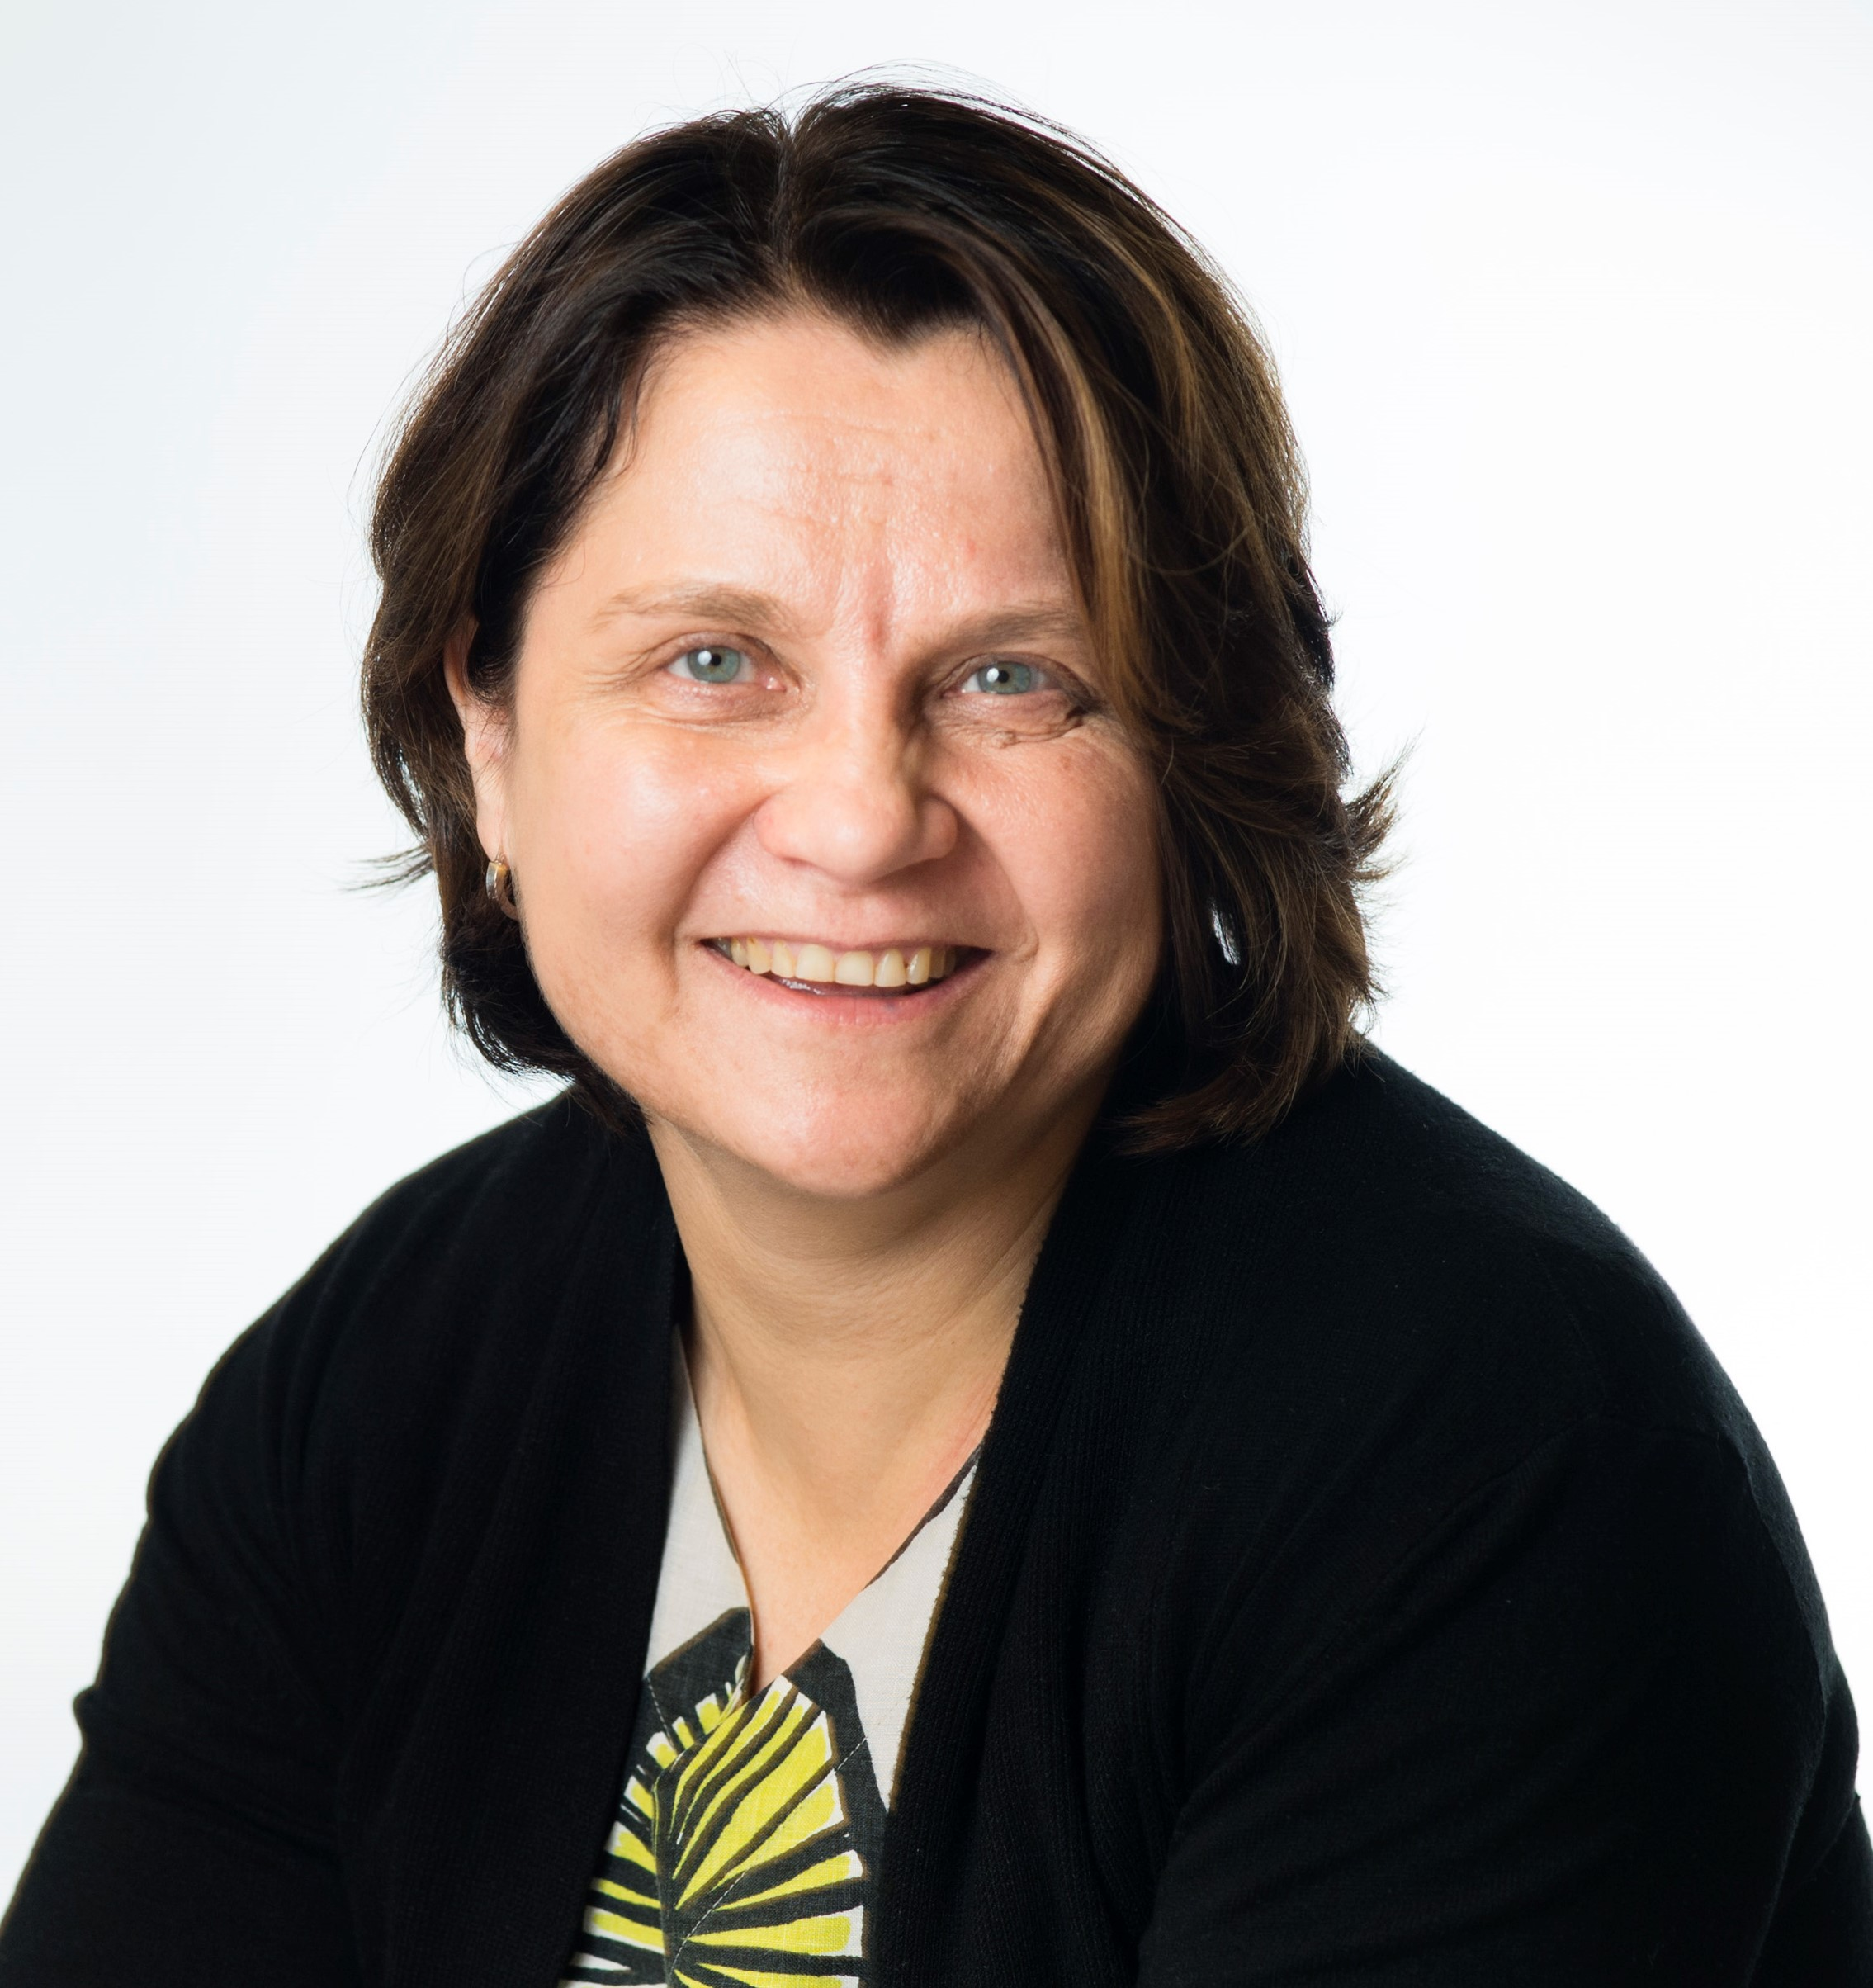 Anne-Maria Pajari